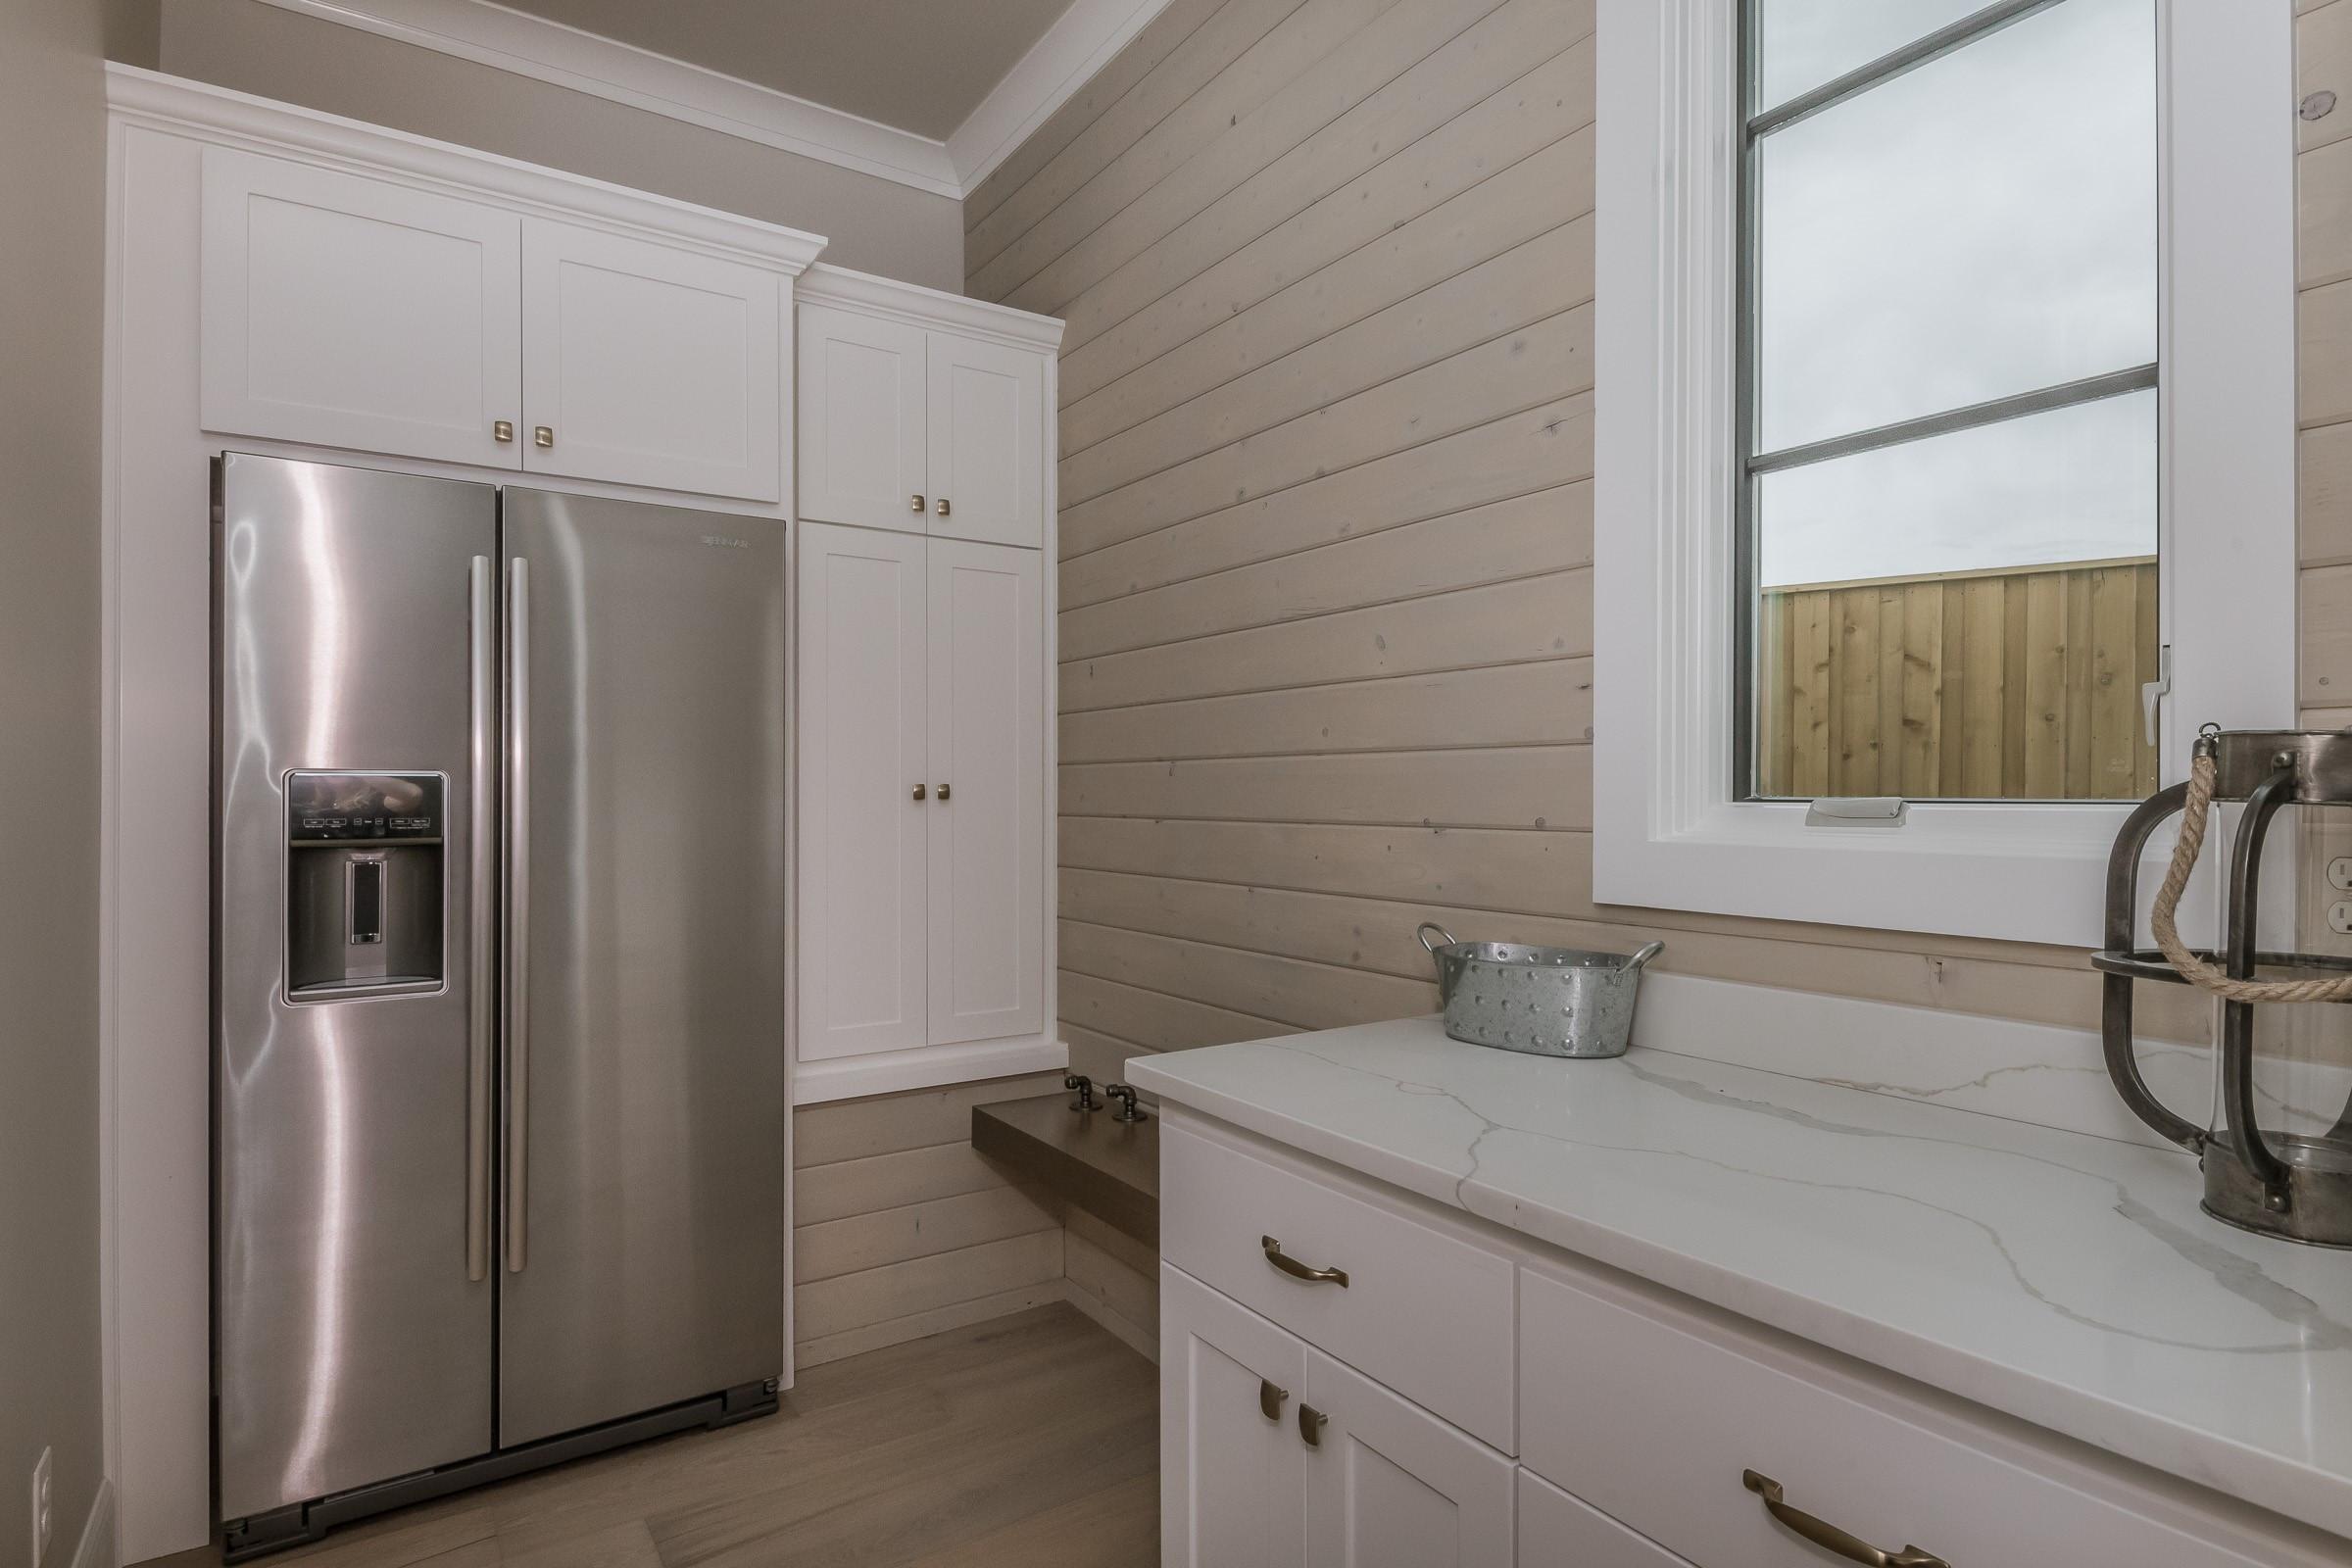 Mudroom with 2nd refrigerator